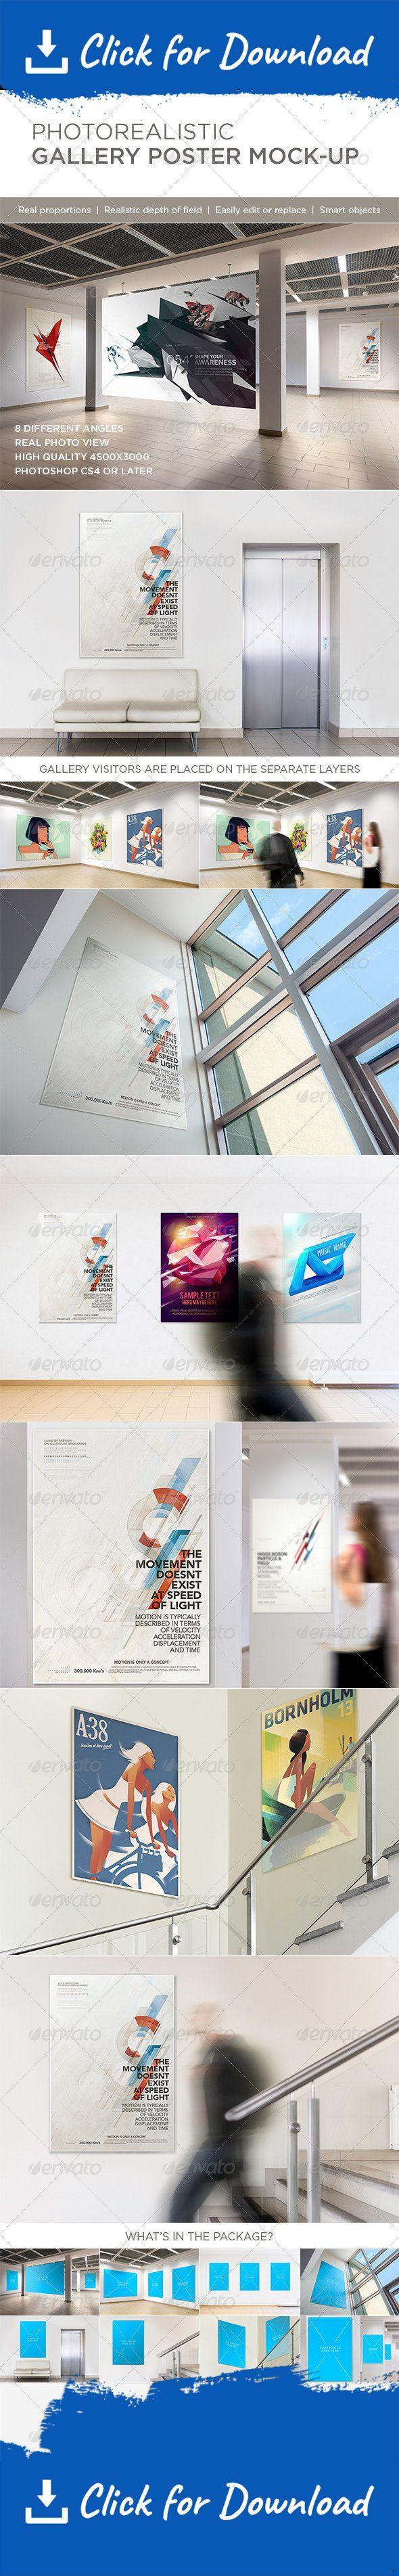 8 best Templates Presentations images on Pinterest